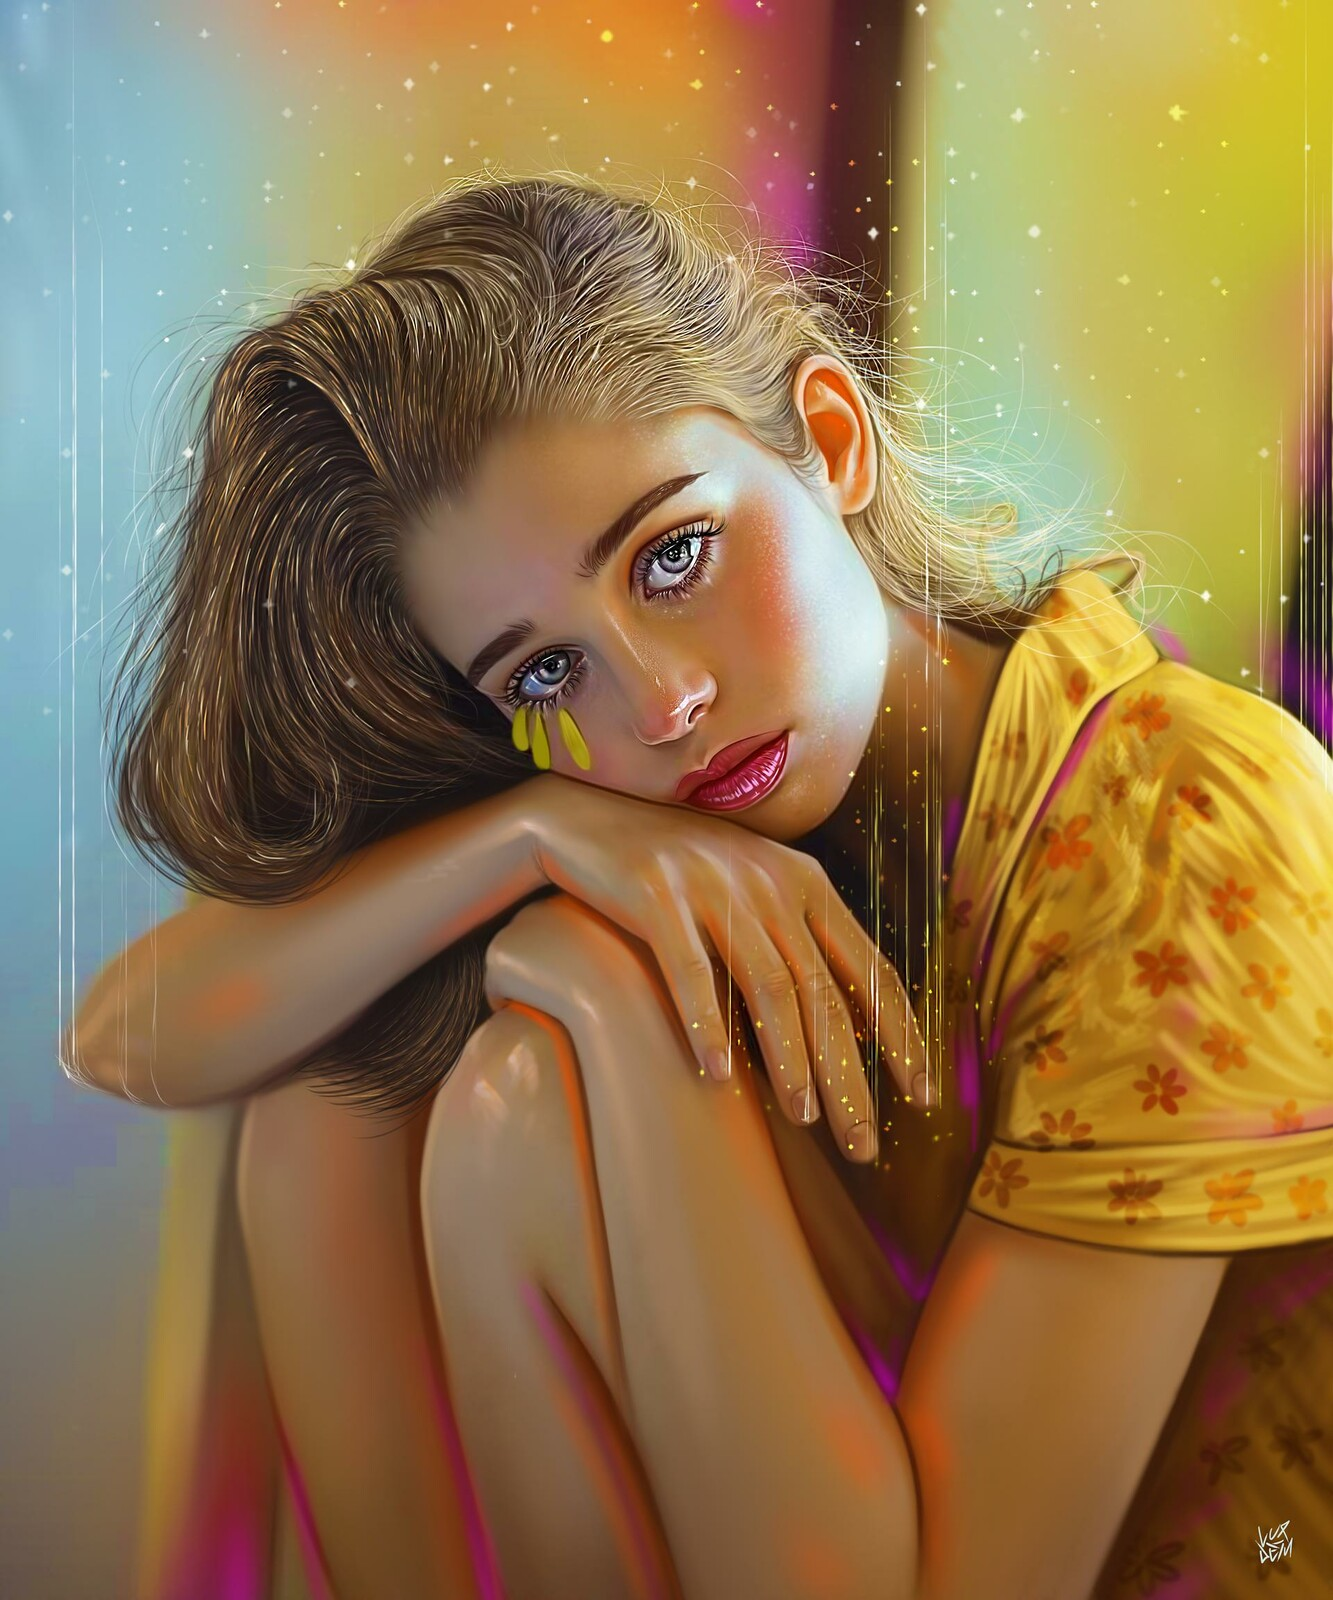 My Portrait Brushes: https://www.artstation.com/vurdem/store/65ej/portrait-brush-set-for-photoshop